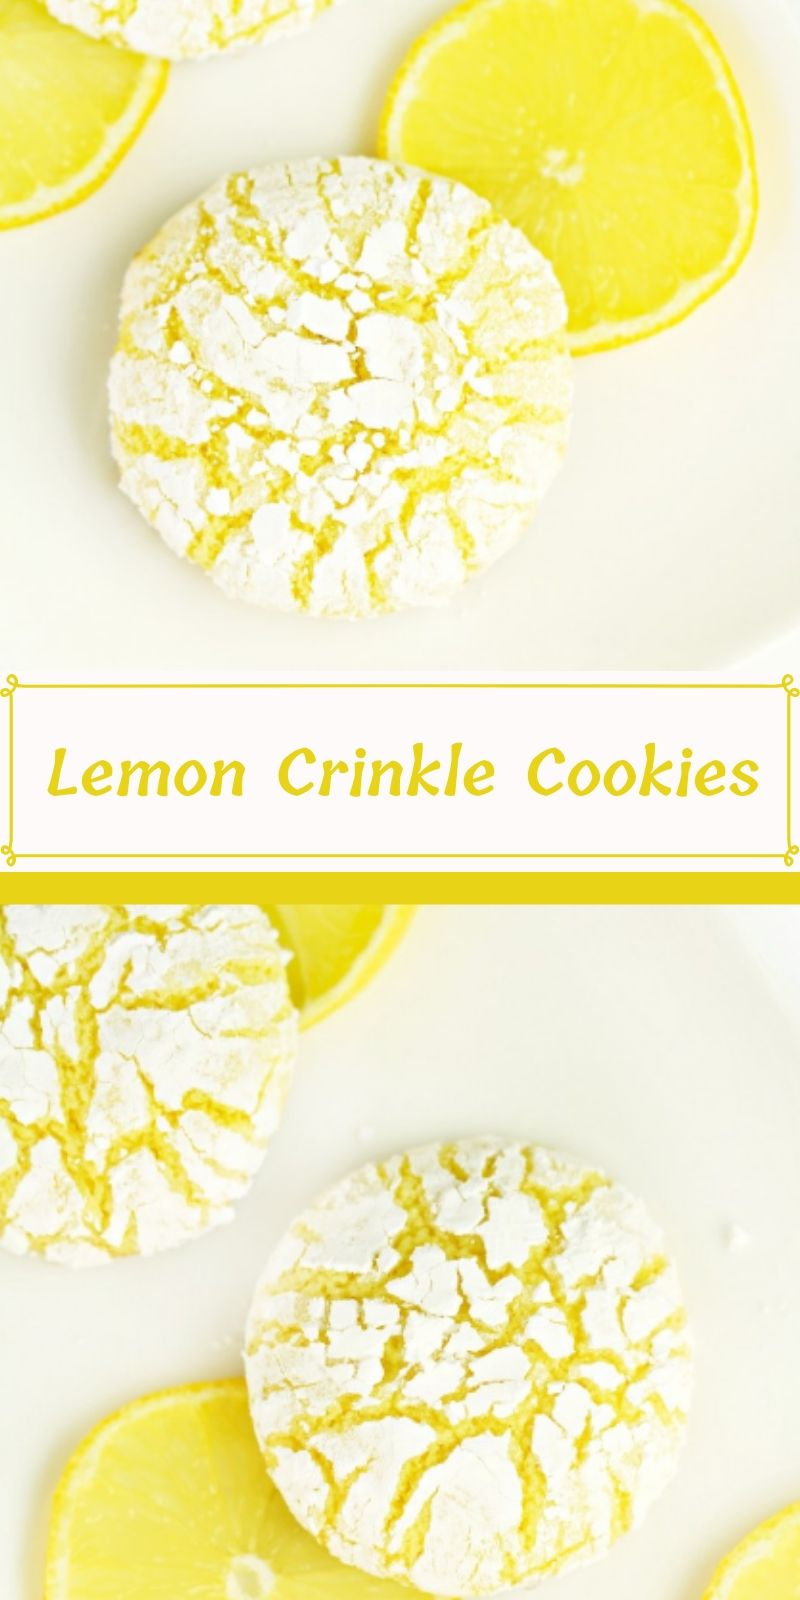 https://www.frugalmomeh.com/2016/05/lemon-crinkle-cookies.html